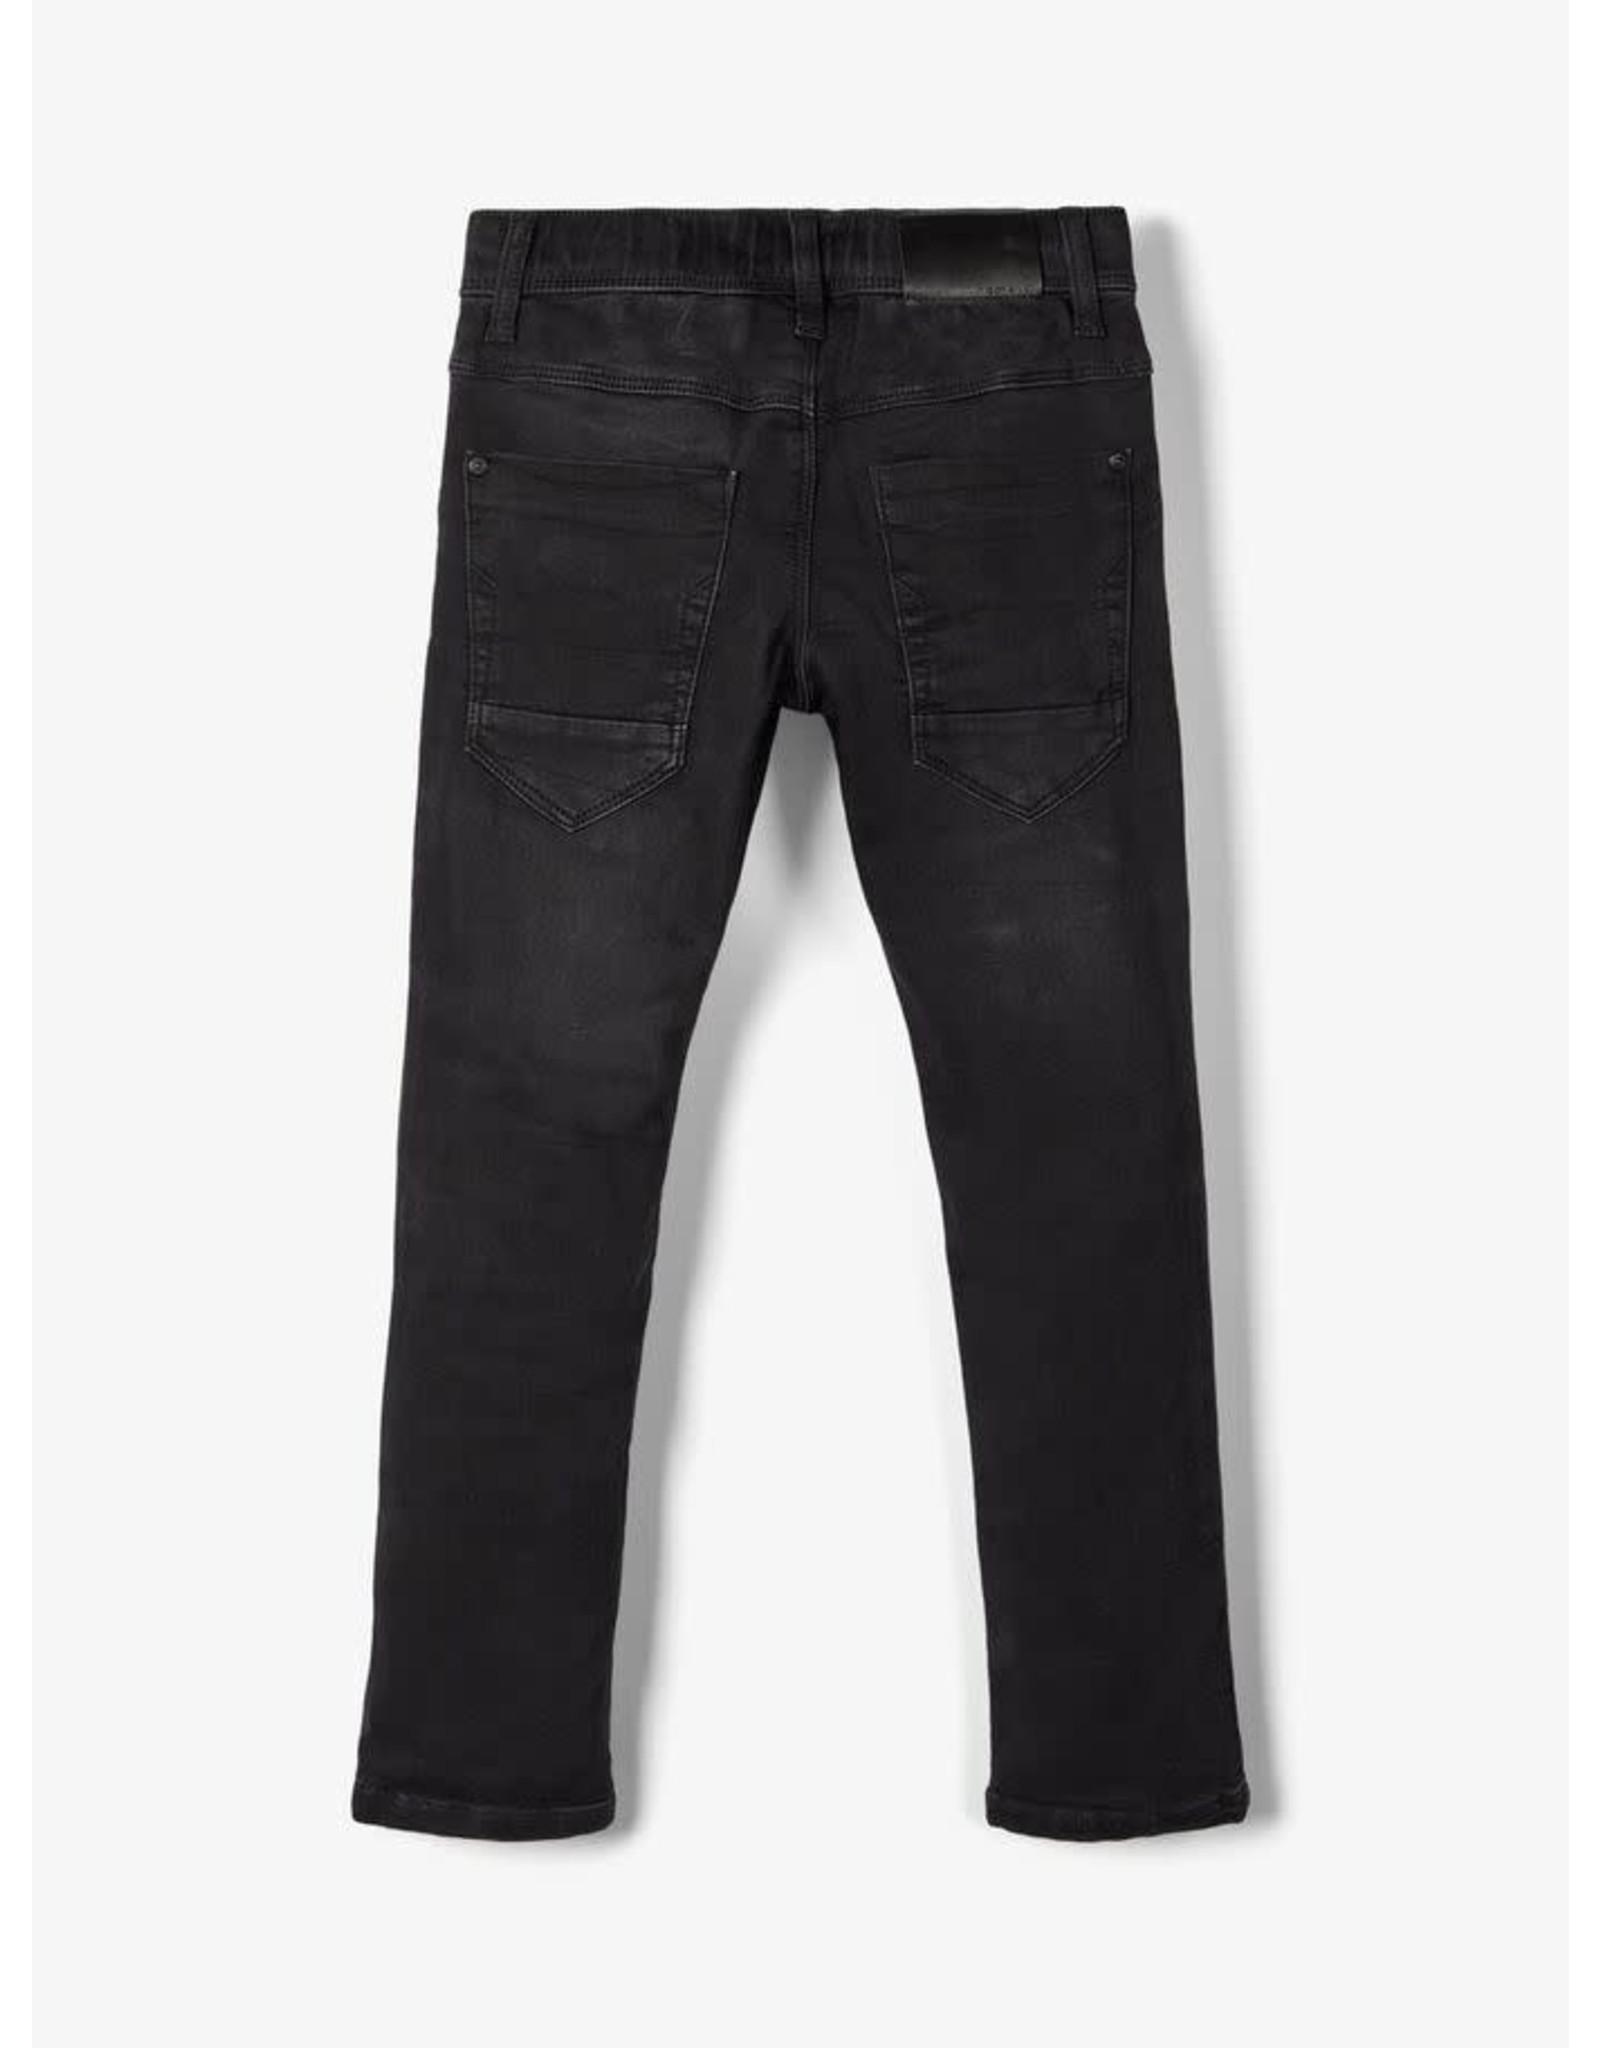 Name It Regular fit sweat denim jeans